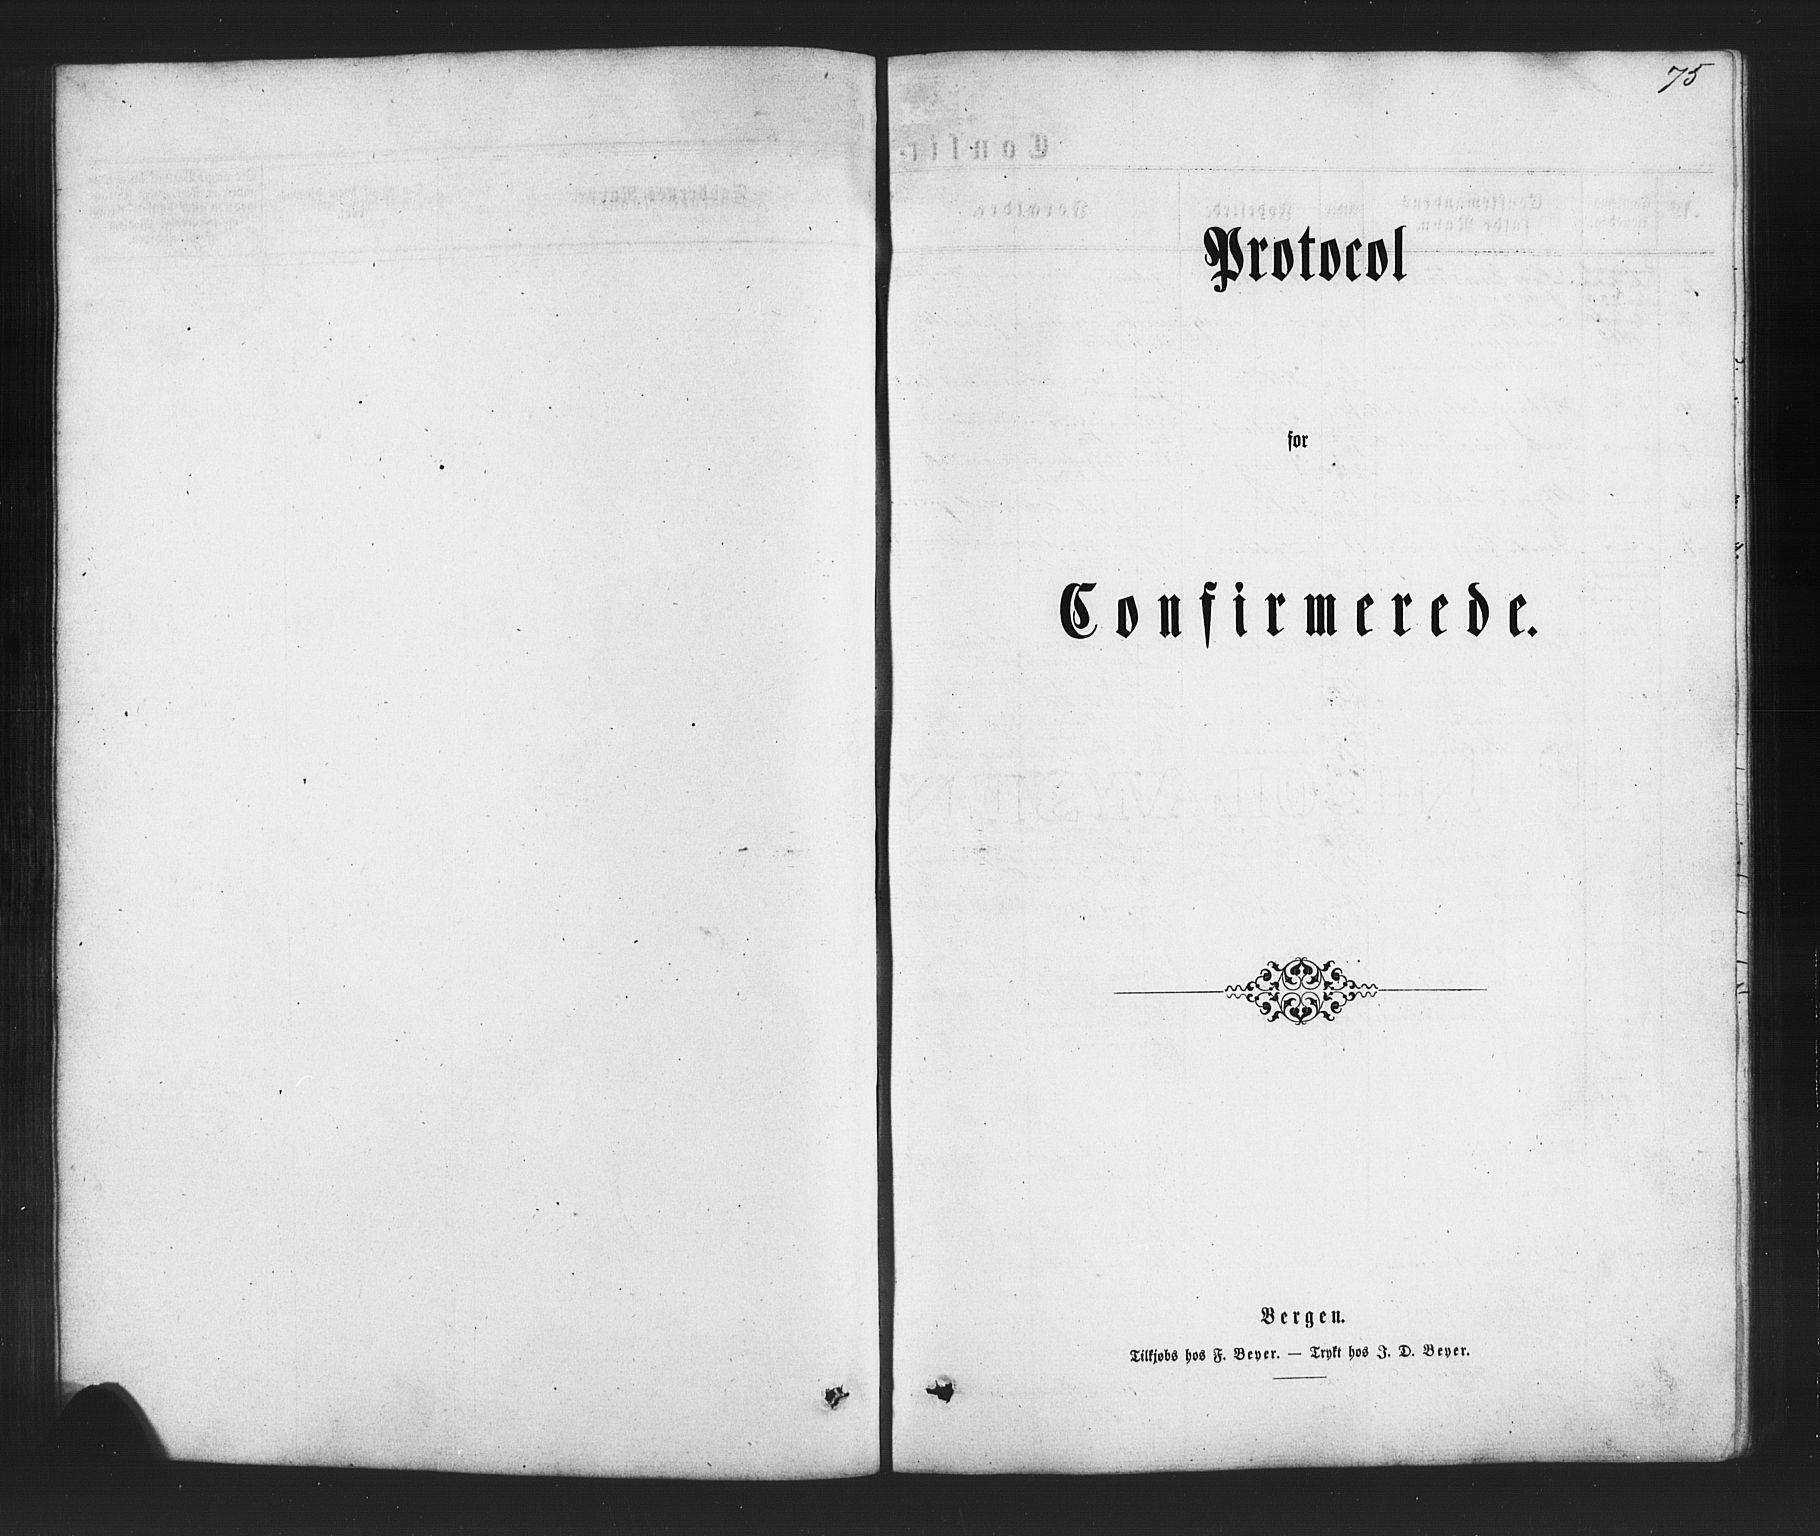 SAB, Finnås sokneprestembete, H/Ha/Hab/Habc/L0001: Klokkerbok nr. C 1, 1860-1887, s. 75